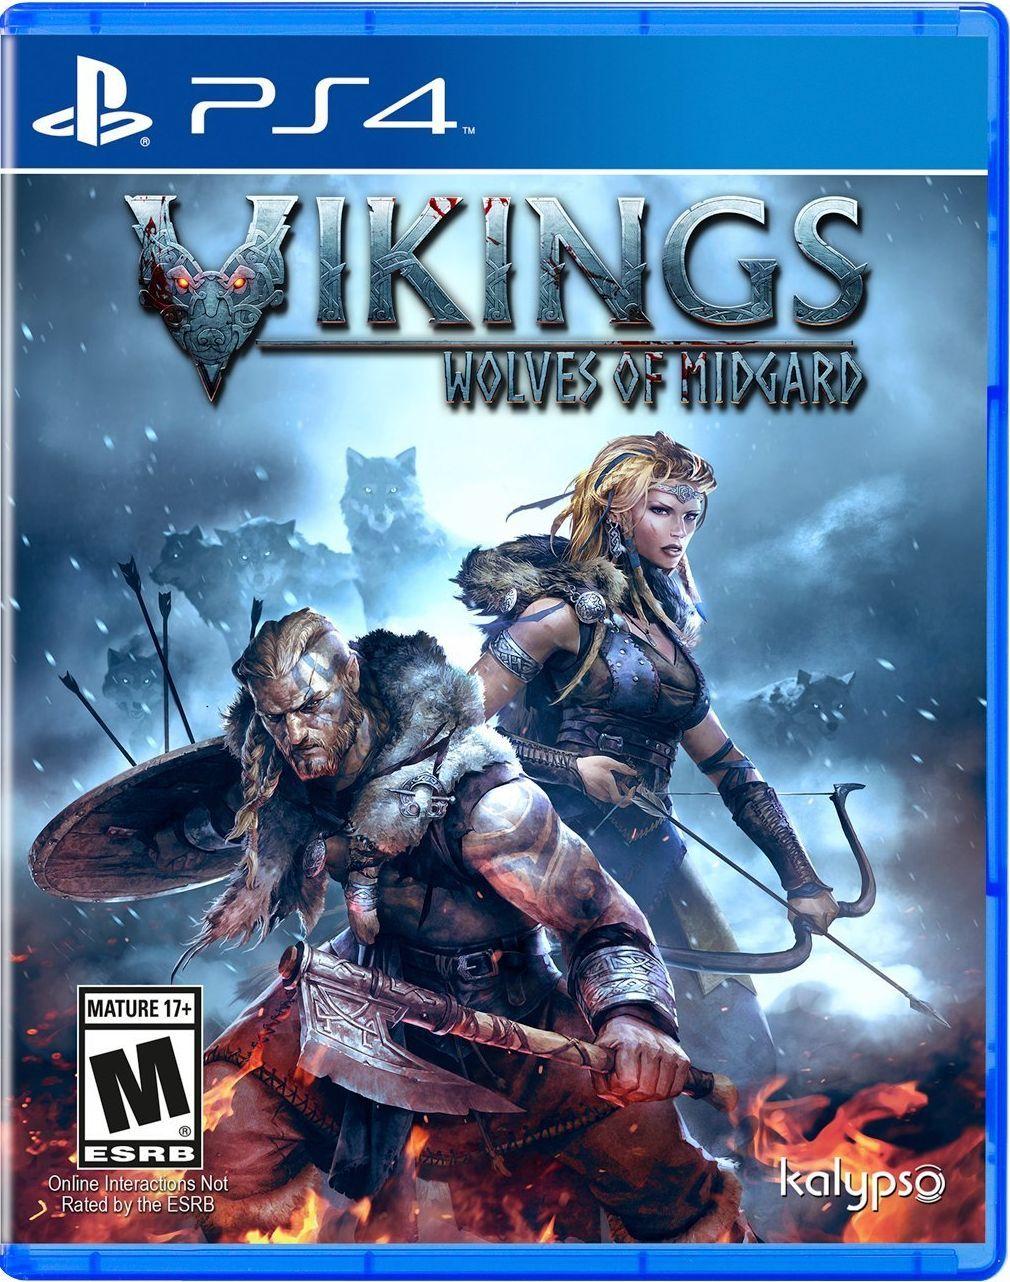 Vikings Wolves of Midgard God of war, Kratos god of war